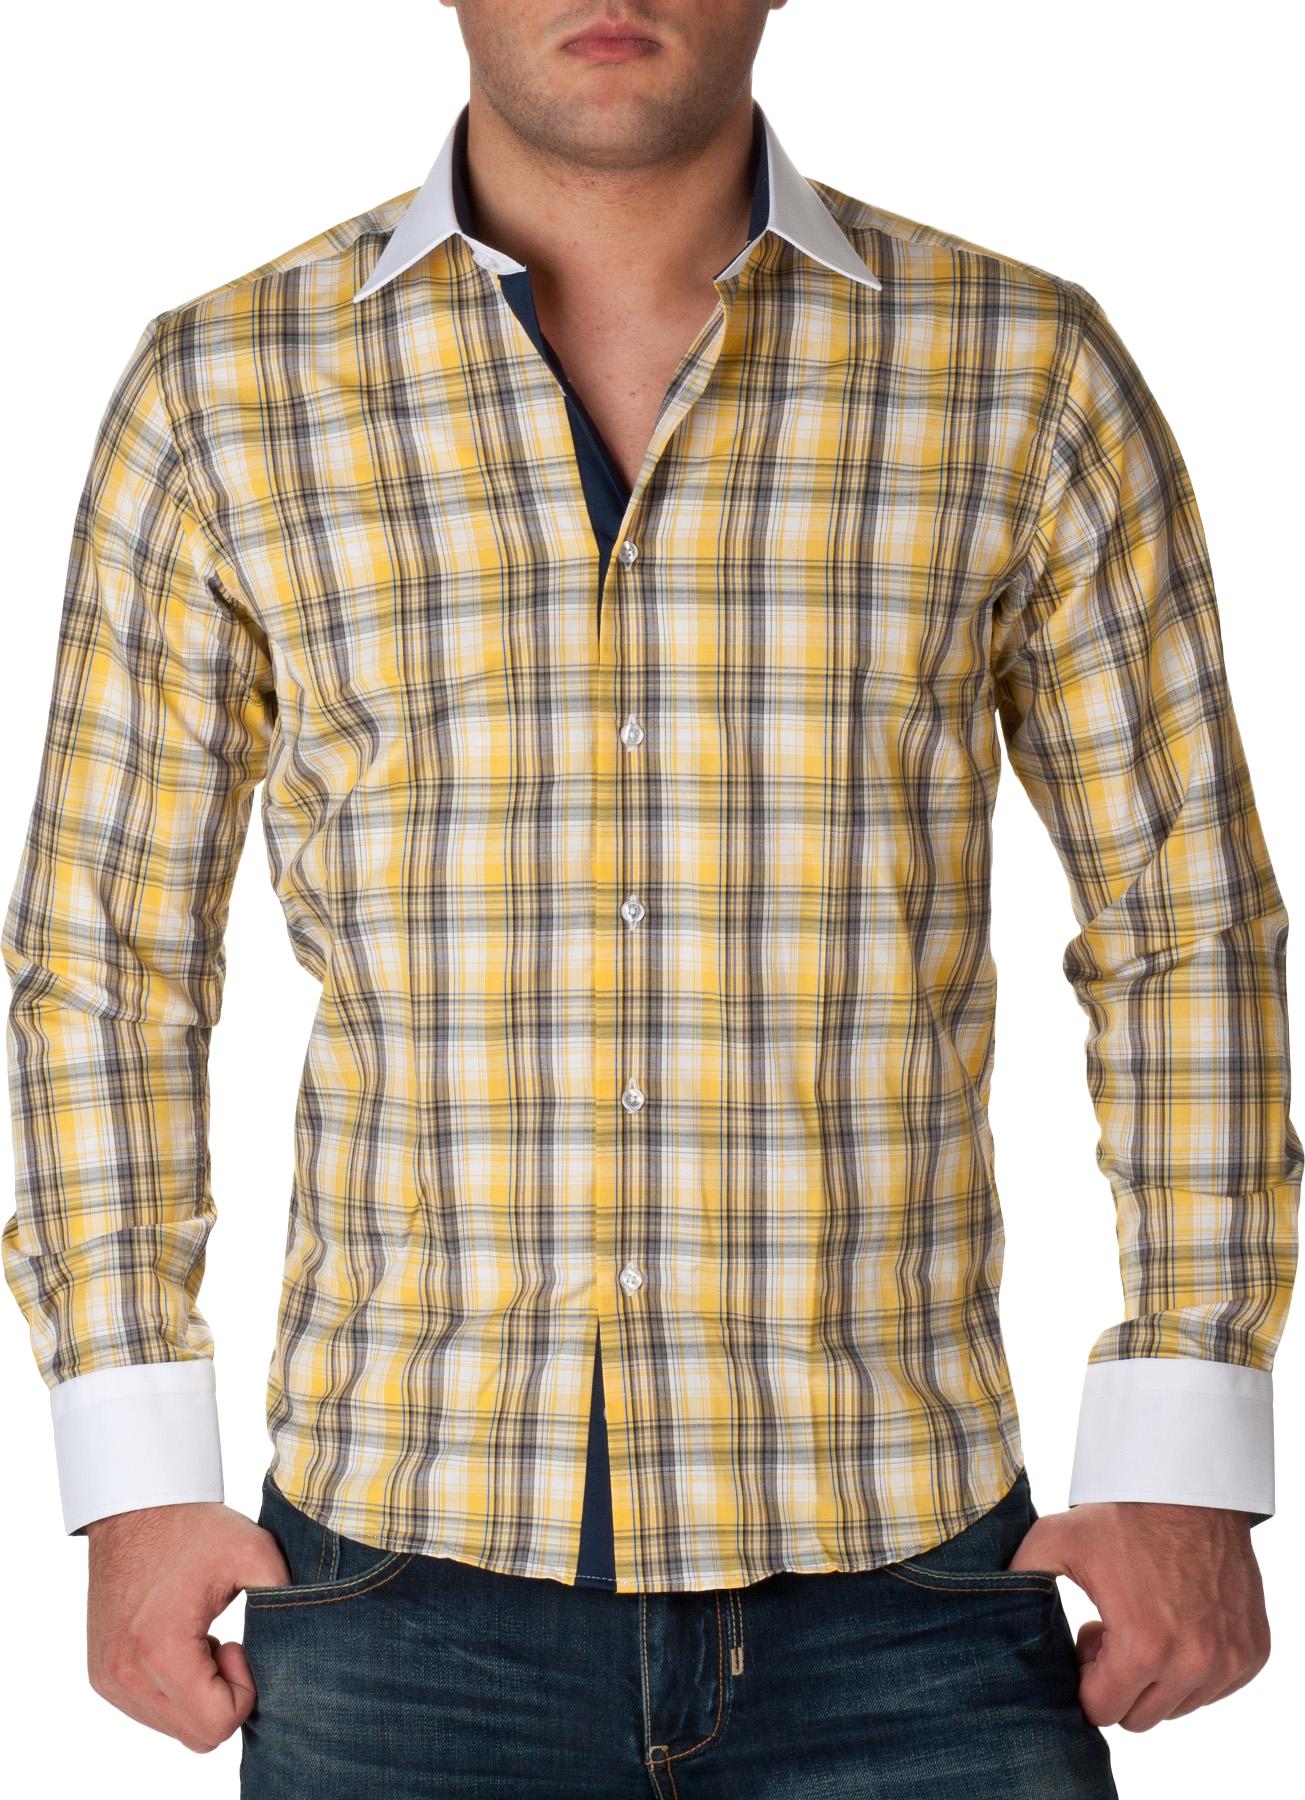 Clipart shirt plaid shirt. Check full dress yellow